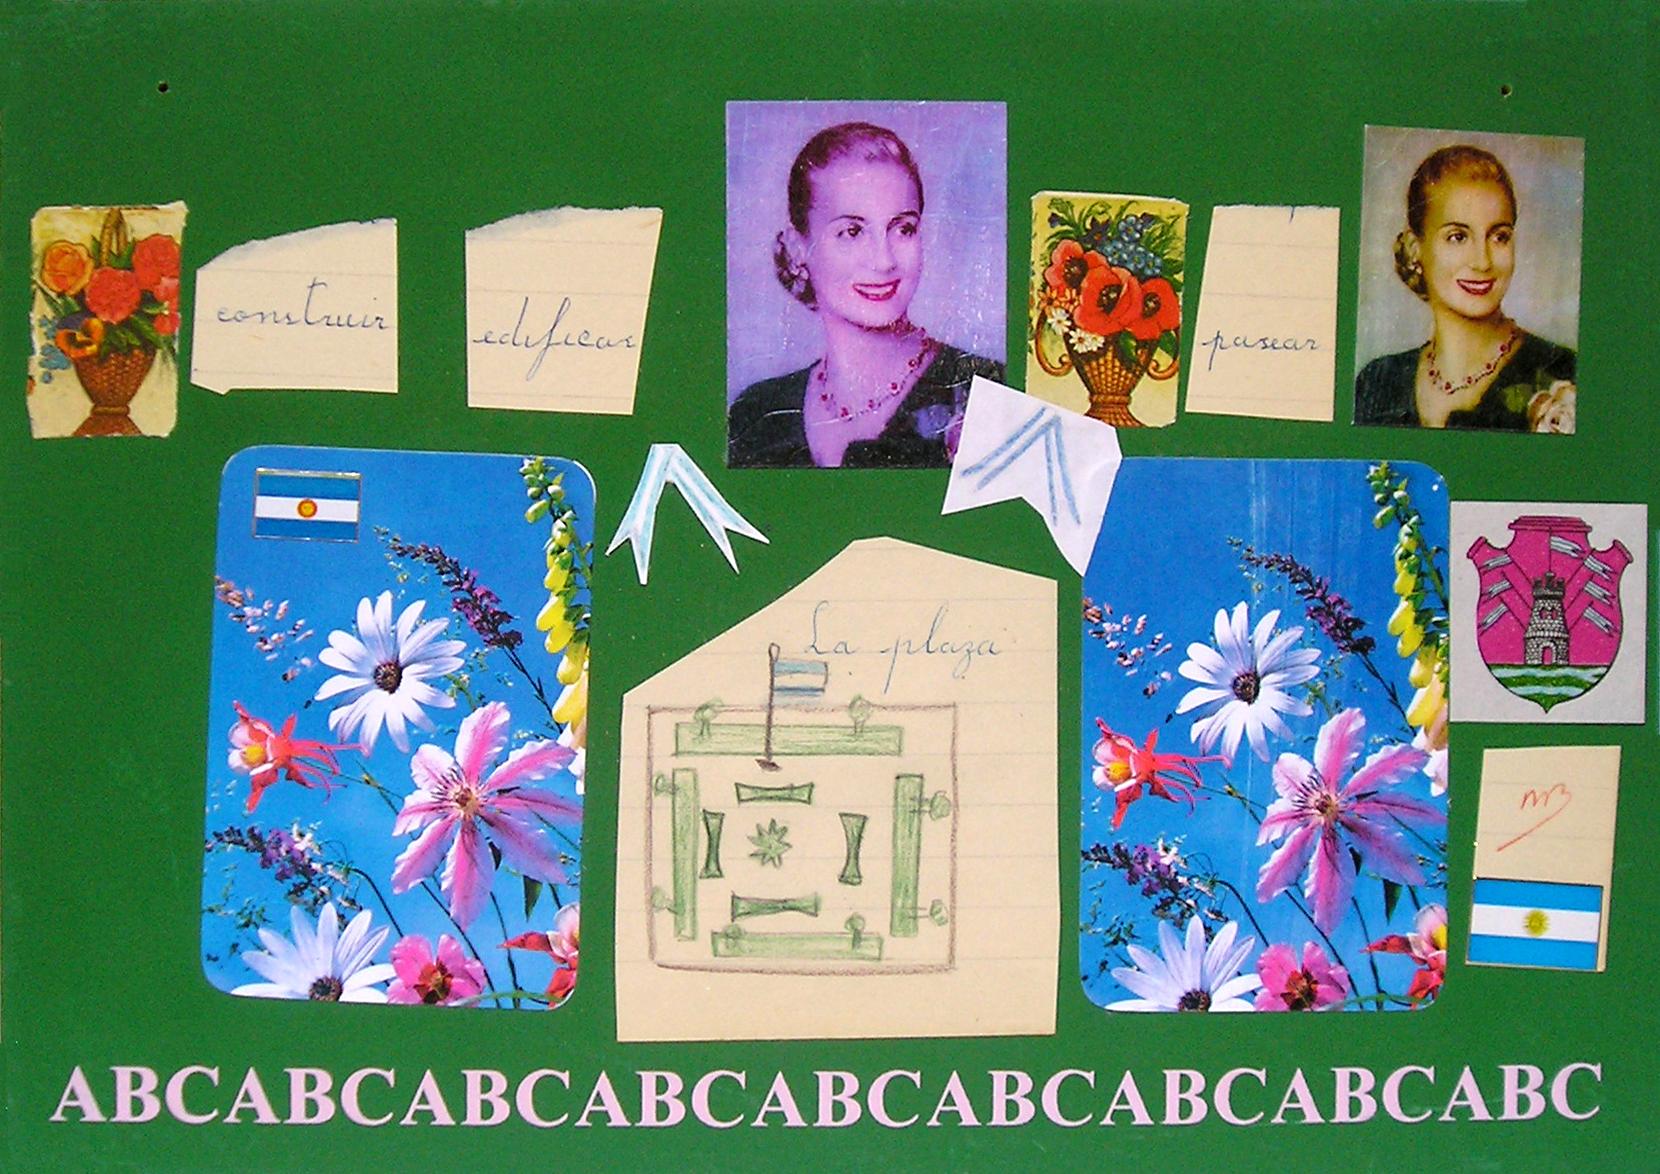 Evita Maestra recorre el país, La Plaza; serie, técnica mixta sobre pizarrón; 21 x 30 cm, 2007